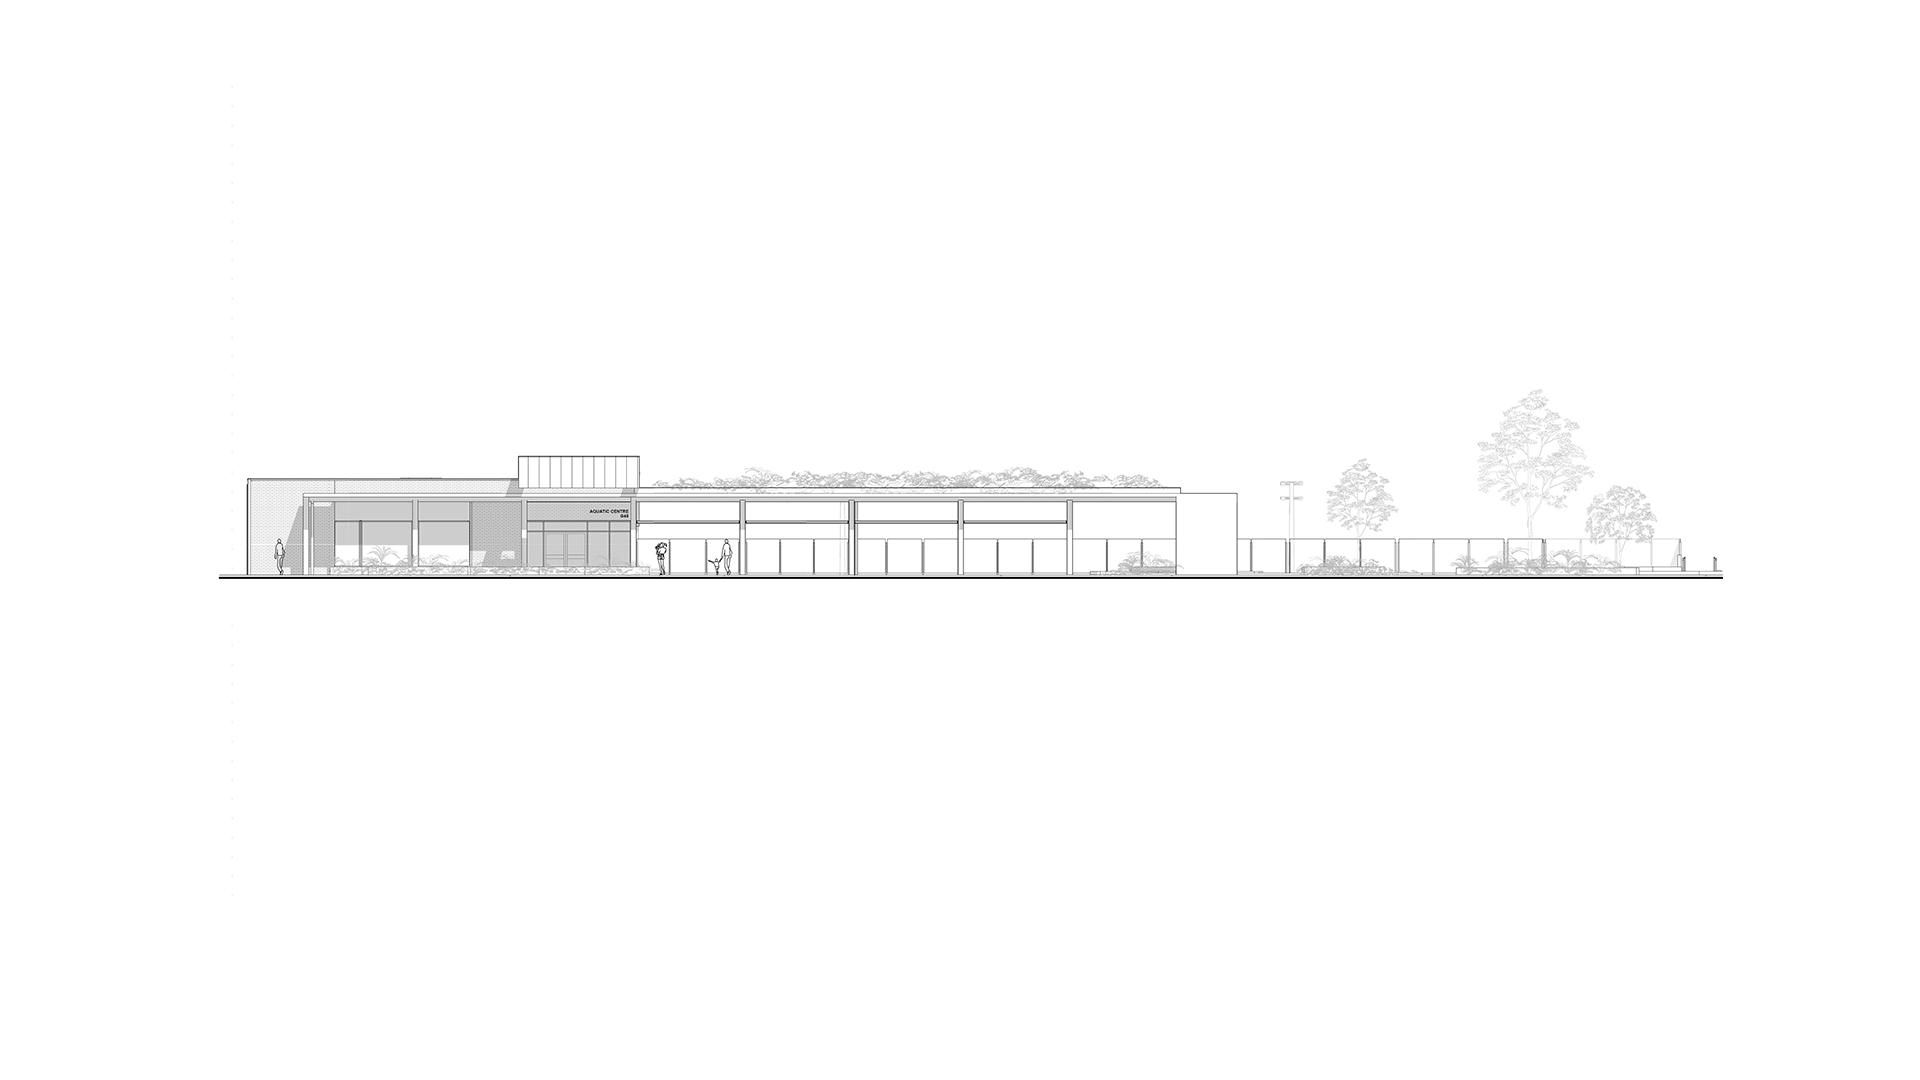 Griffith University Aquatic Centre Elevation